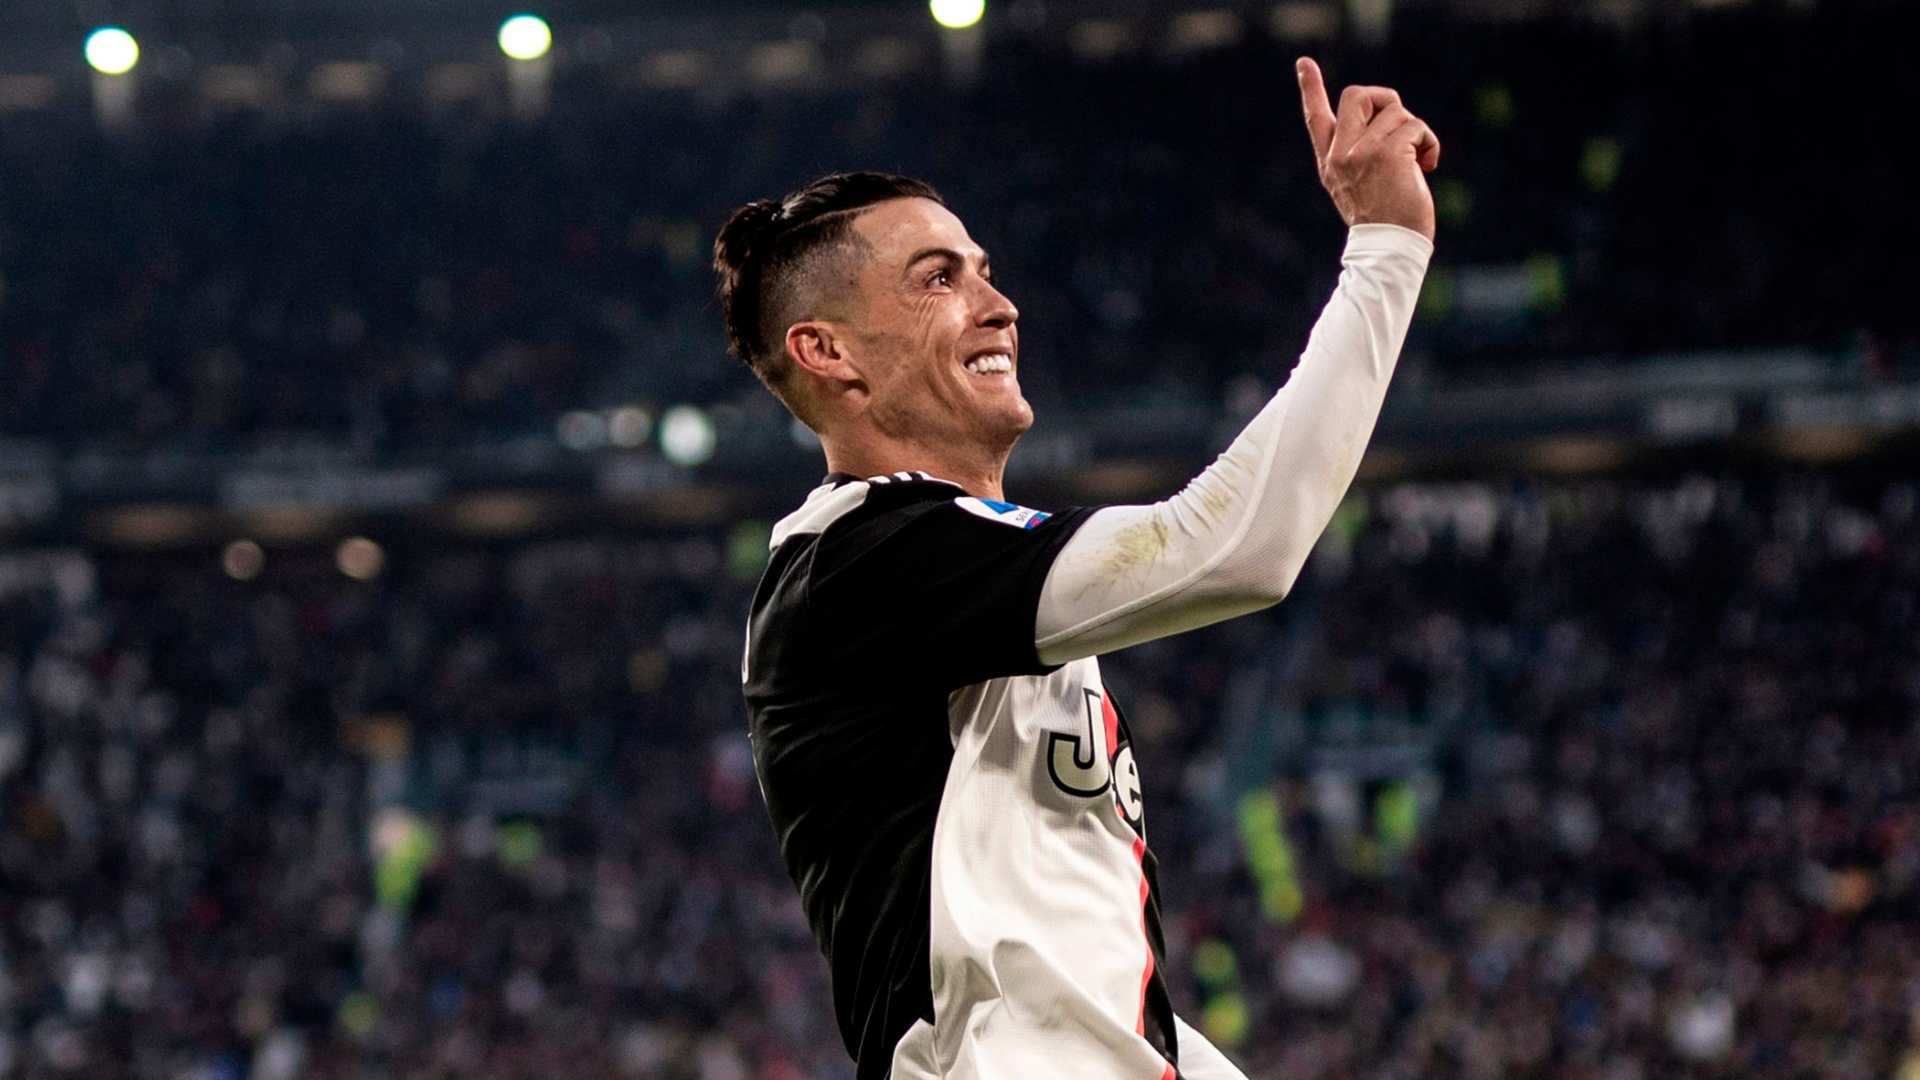 VIDEO - Sarri va aider Ronaldo à gagner un sixième Ballon d'Or